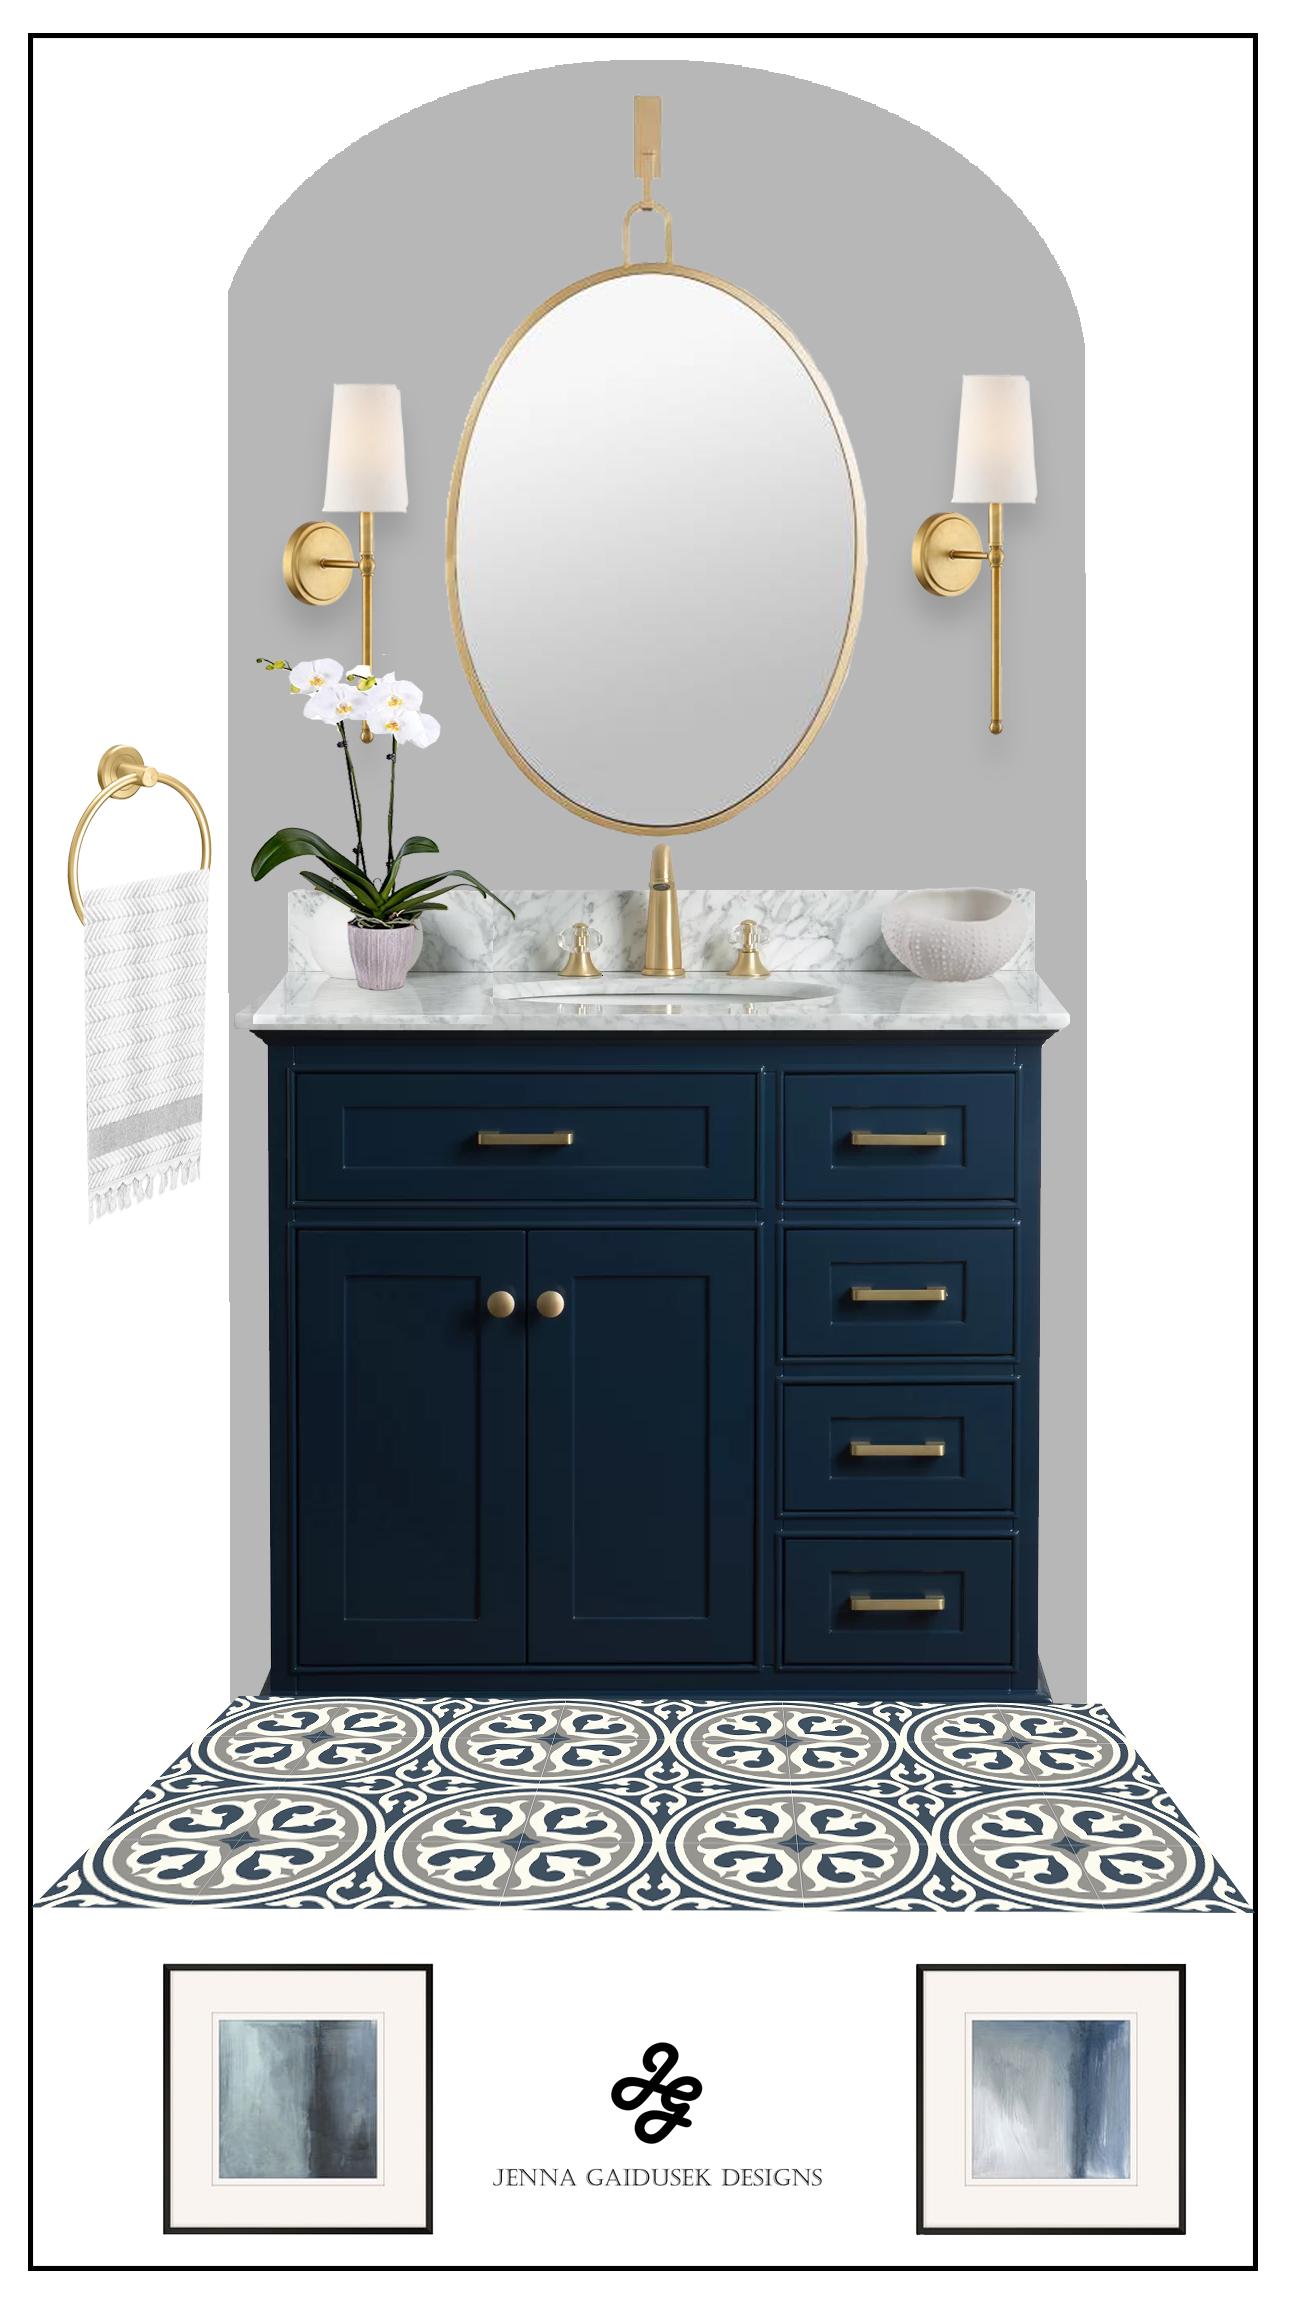 Coastal small bathroom concept plan